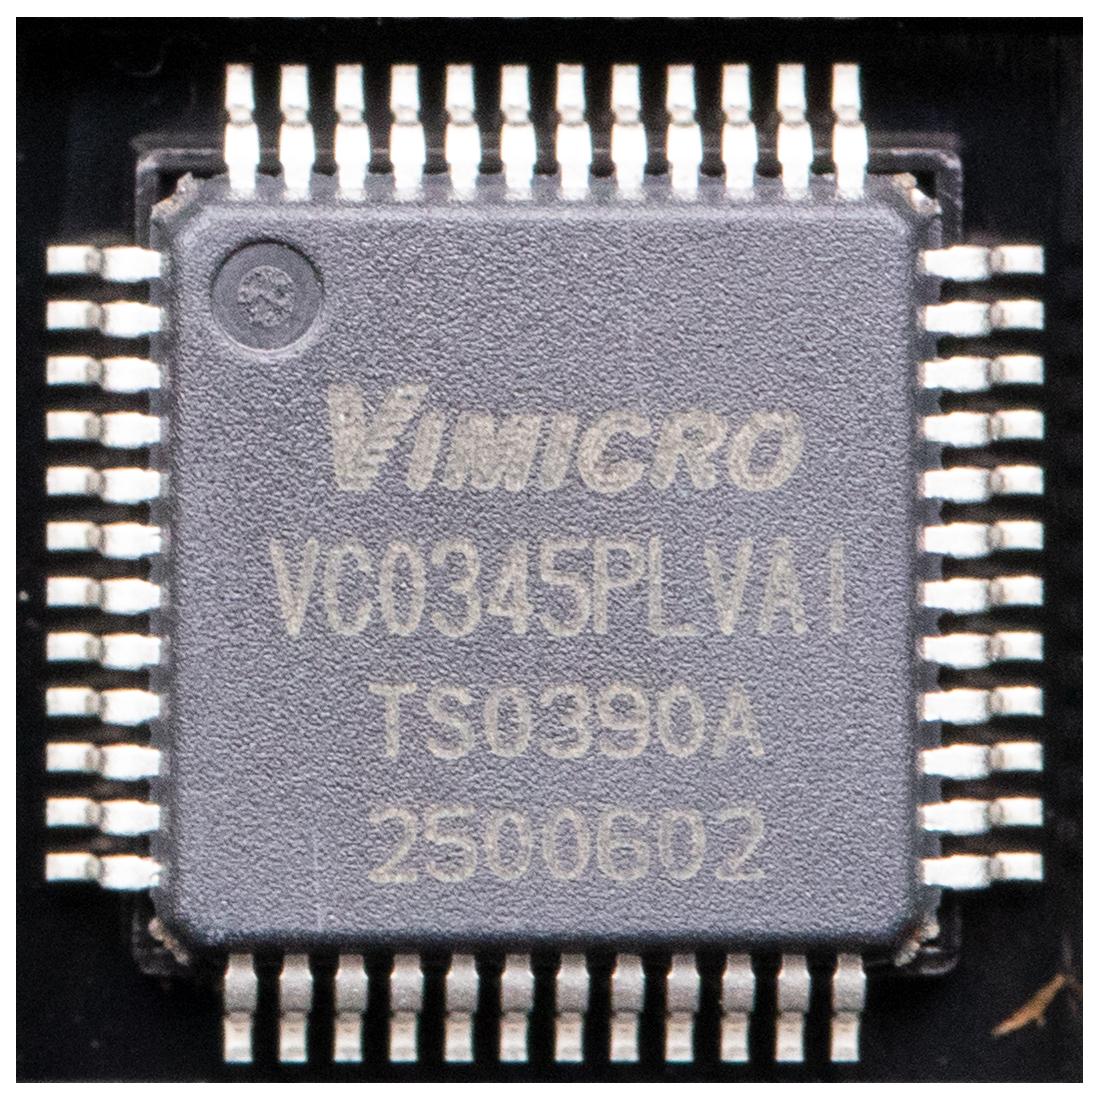 VIMICRO廉价笔记本摄像头主控,VIMICRO低端笔记本摄像头主控,中星微代理商,中星微方案商,中星微主控代理商,中星微电子摄像头主控经销商,中星微官网,VC0345价格,VC0345 datasheet,VC0345文档下载,VC0345原装现货,VC0345现货库存,VC0345芯片,VC0345图片,VC0345规格书,VC0345代理商,VC0345技术支持,VC0345产品介绍,VC0345参数,VC0345方案商,VC0345分销商,VC0345经销商,VC0345官网,VC0345生产厂家,VC0345专卖店,VC0345高价收购,VC0345模组,VC0345模块,VC0345特价,VC0345库存,VC0345生产商,VC0345哪里买,VC0345性价比,VC0345PLNA规格书,VC0345PLVAI现货库存,VC0345PLVAI简介